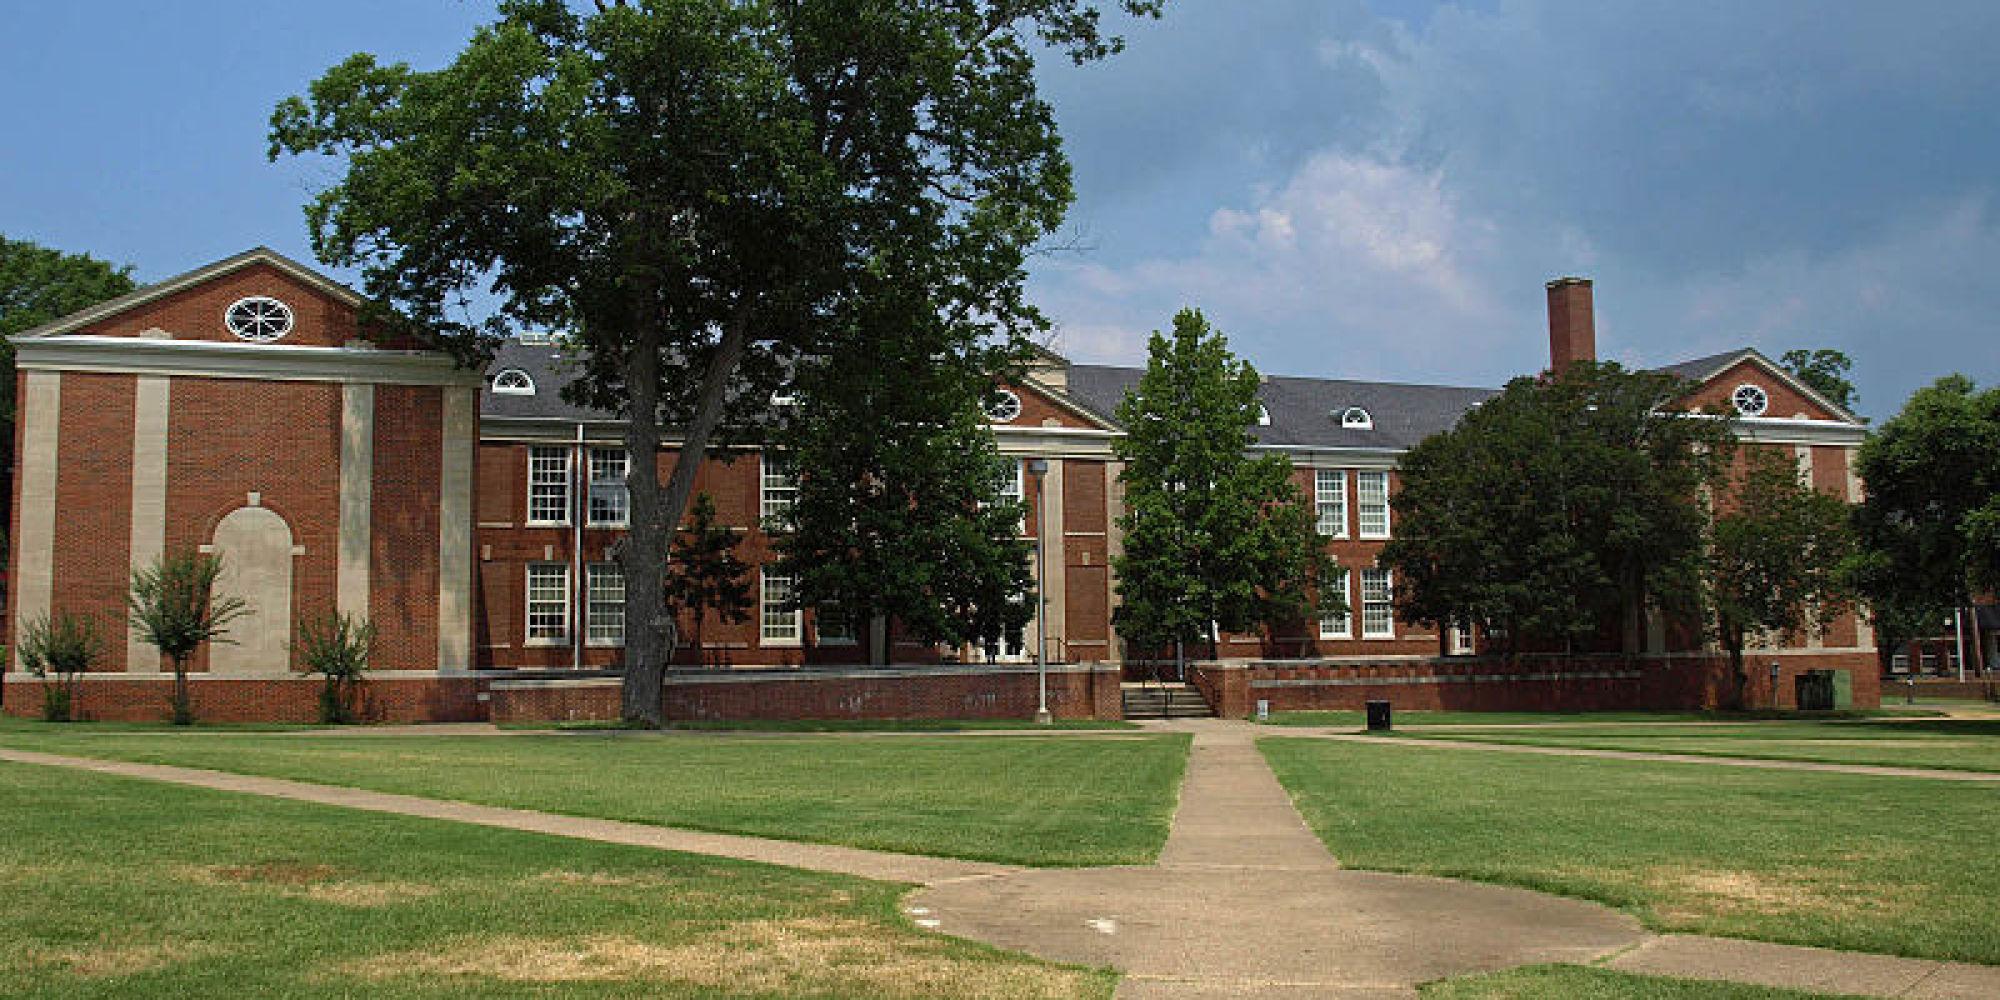 Alabama State University S President Has An Interesting